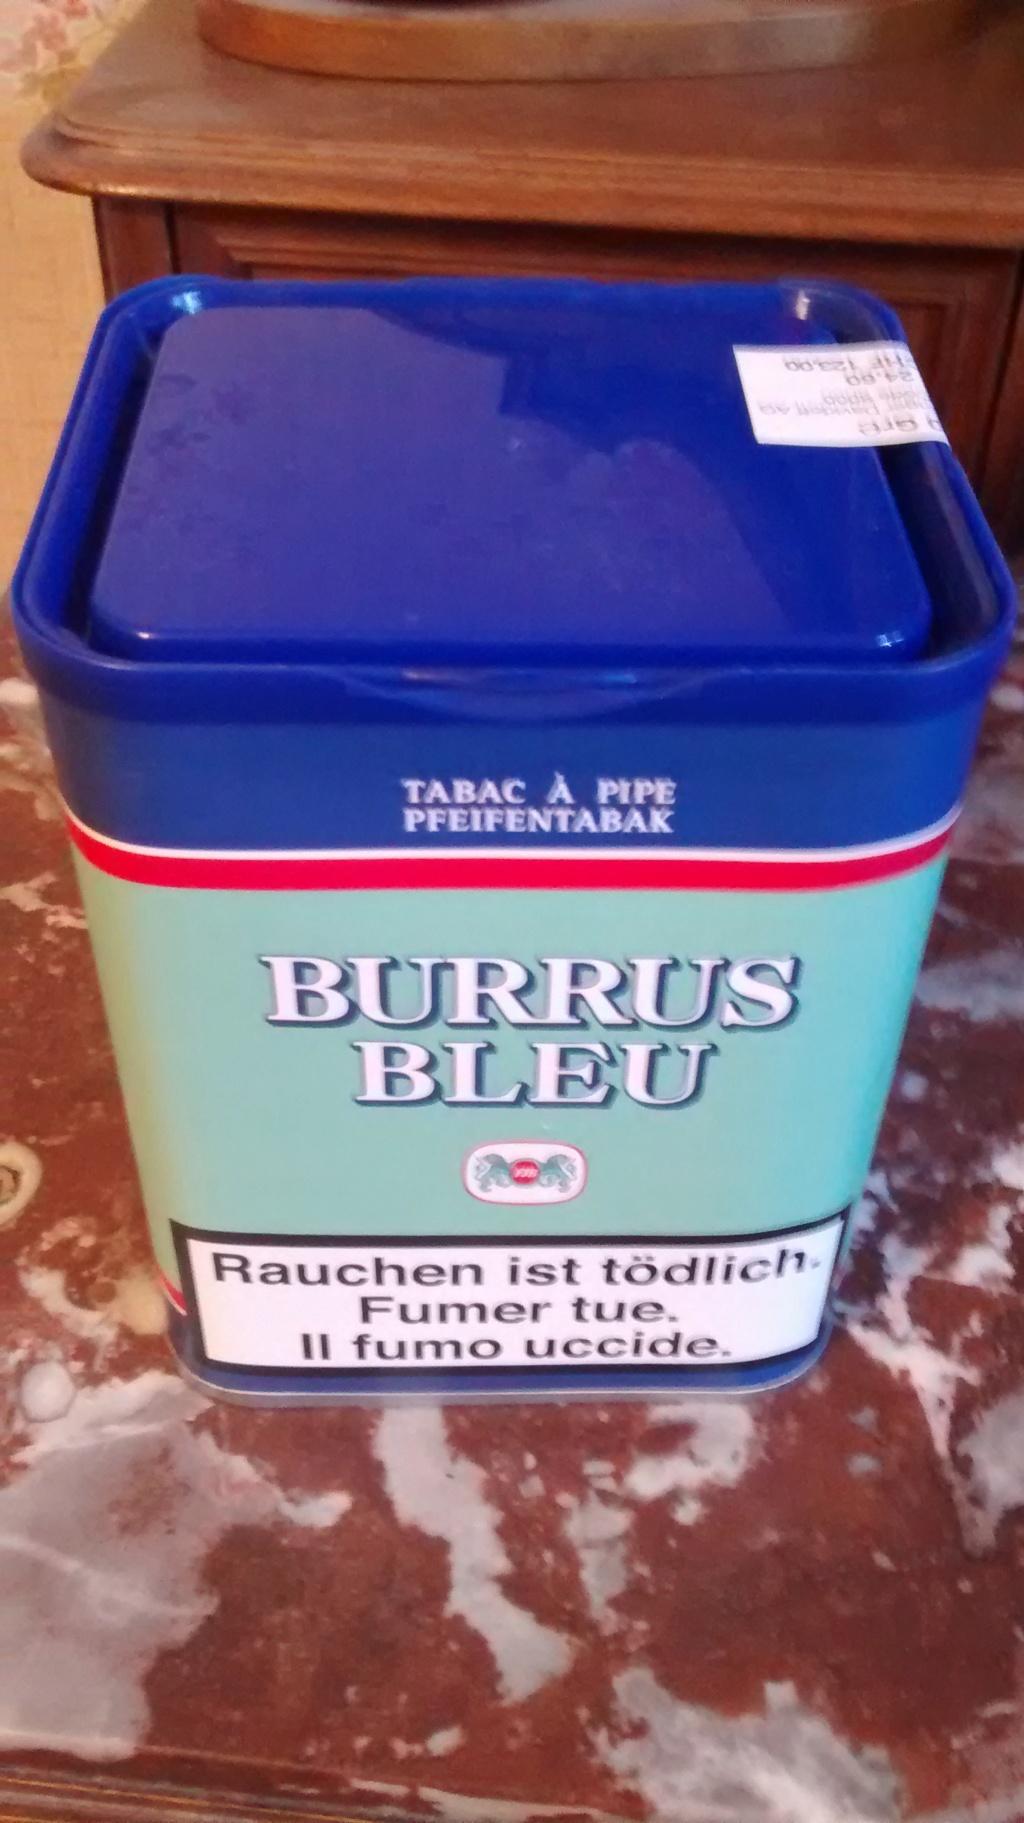 Burrus bleu - Page 3 Img_2010